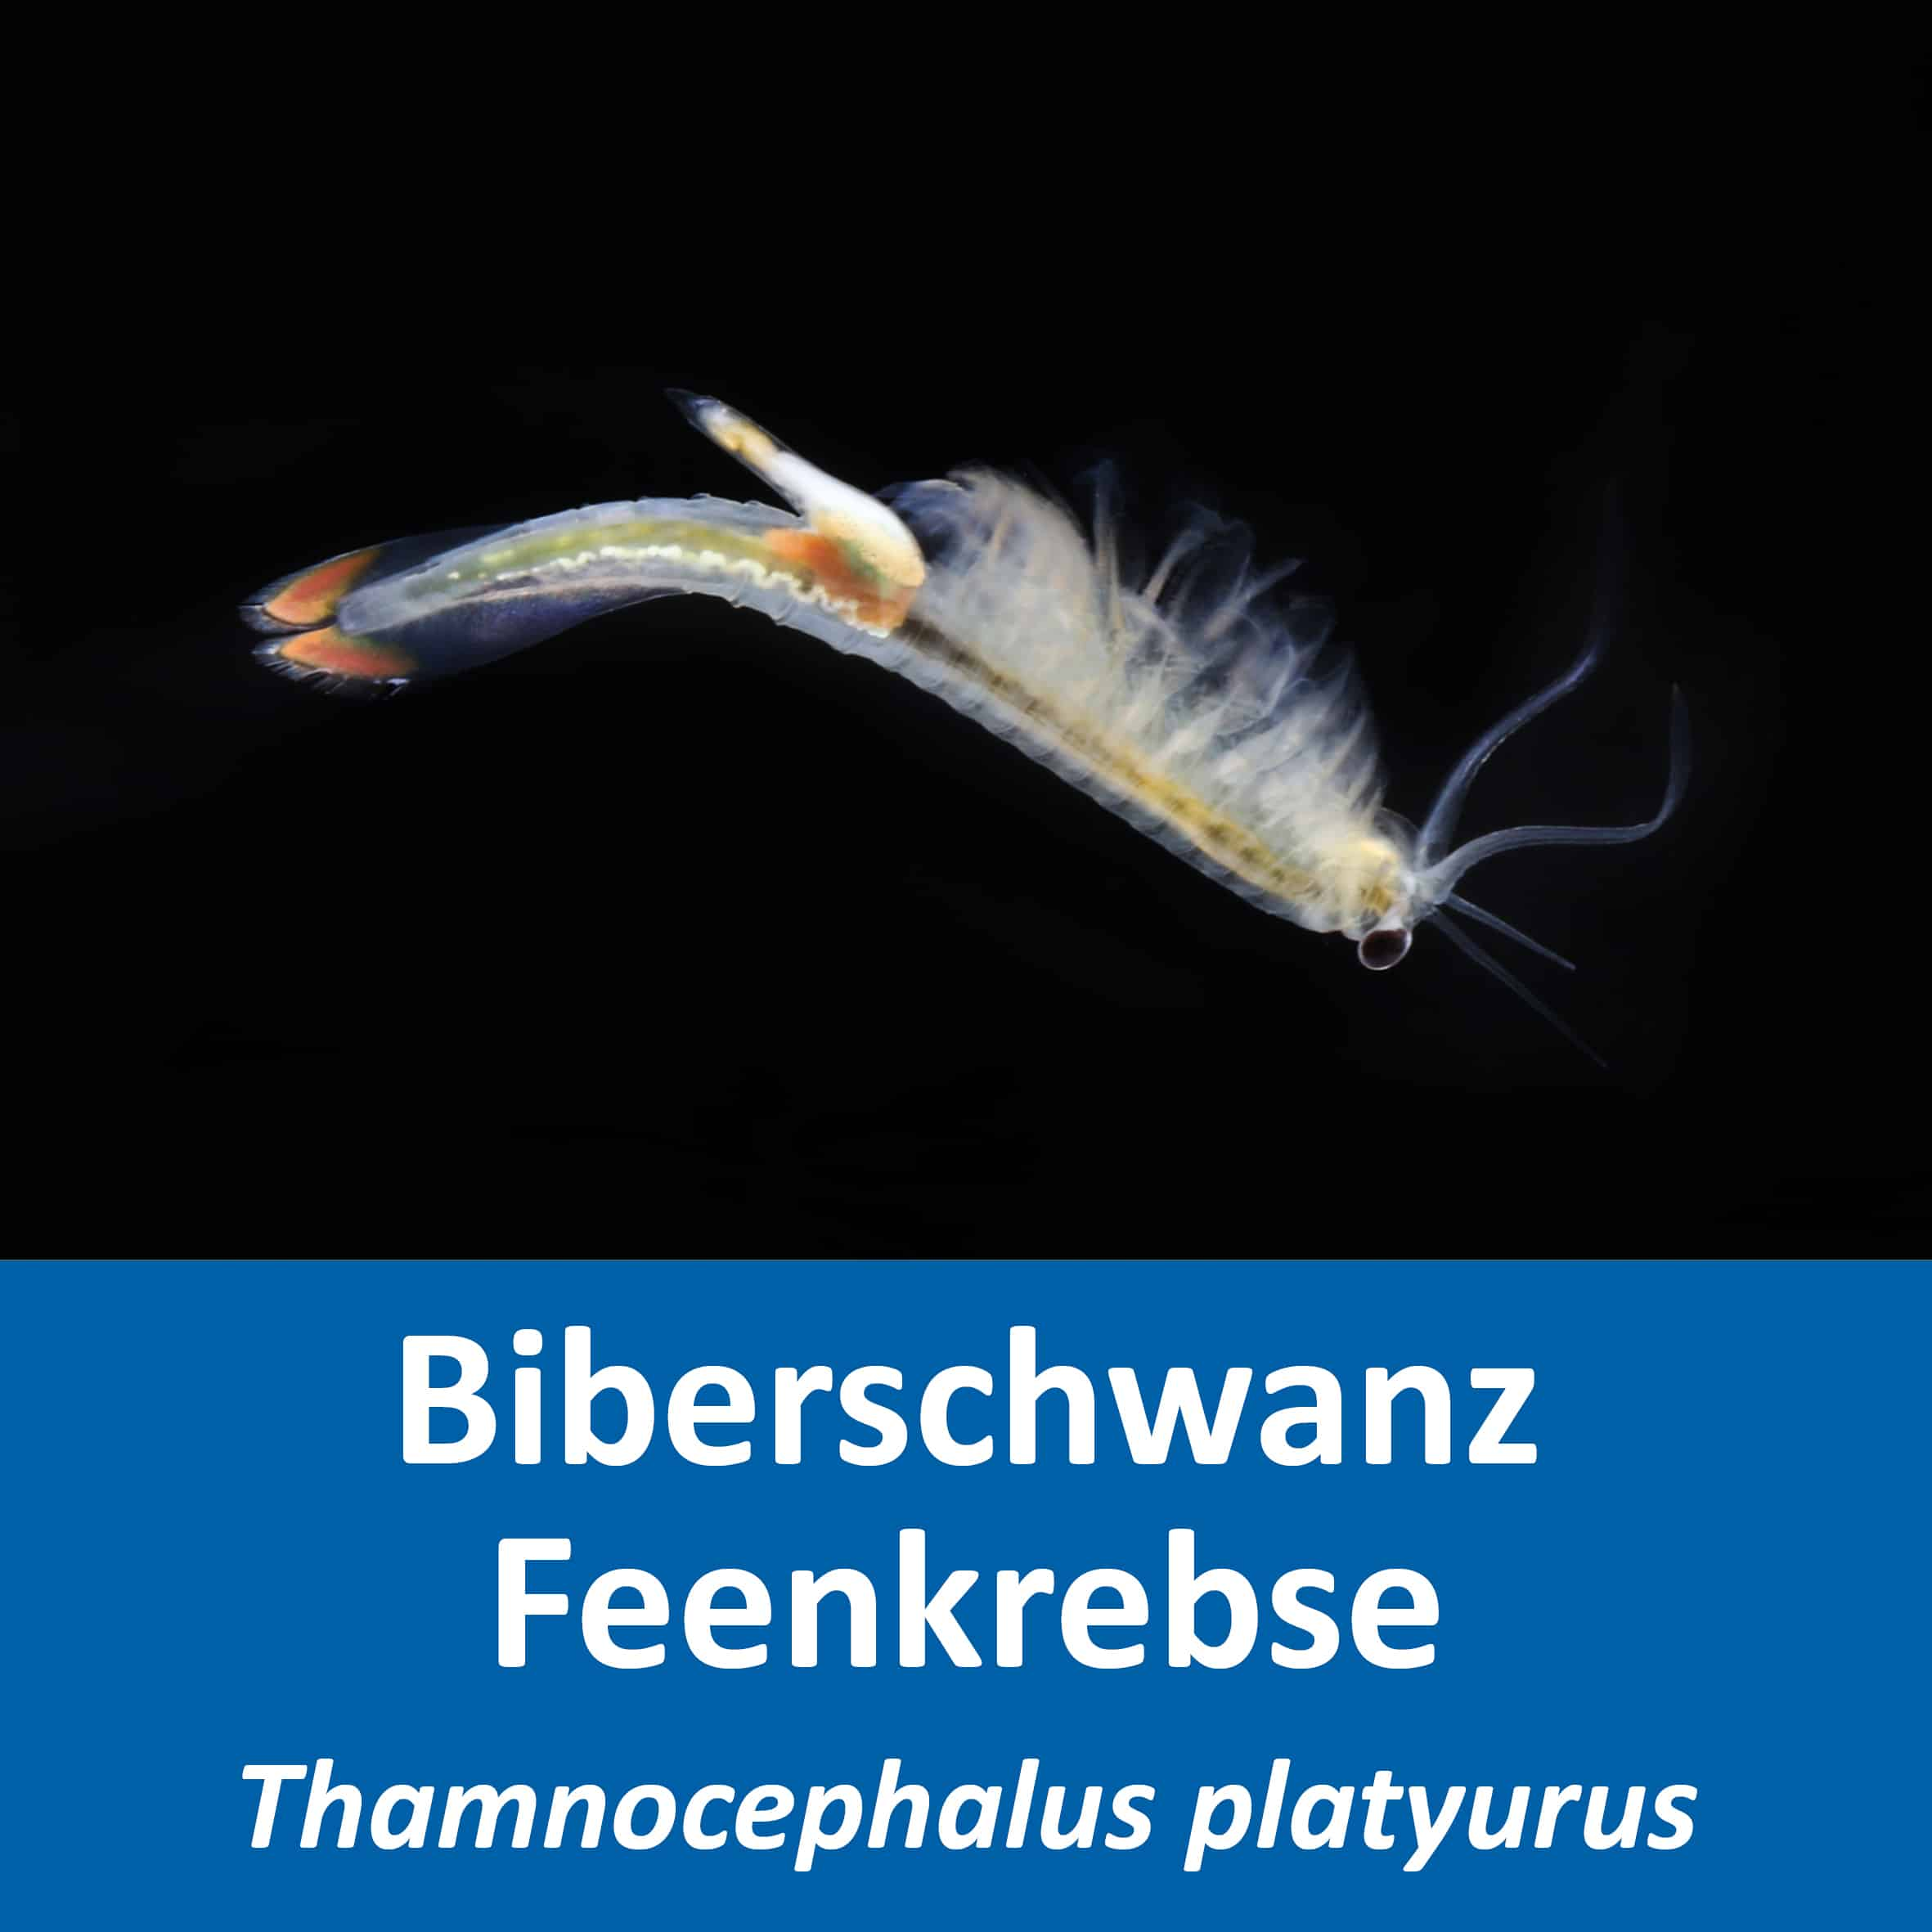 Biberschwanz Feenkrebse (Thamnocephalus platyurus)